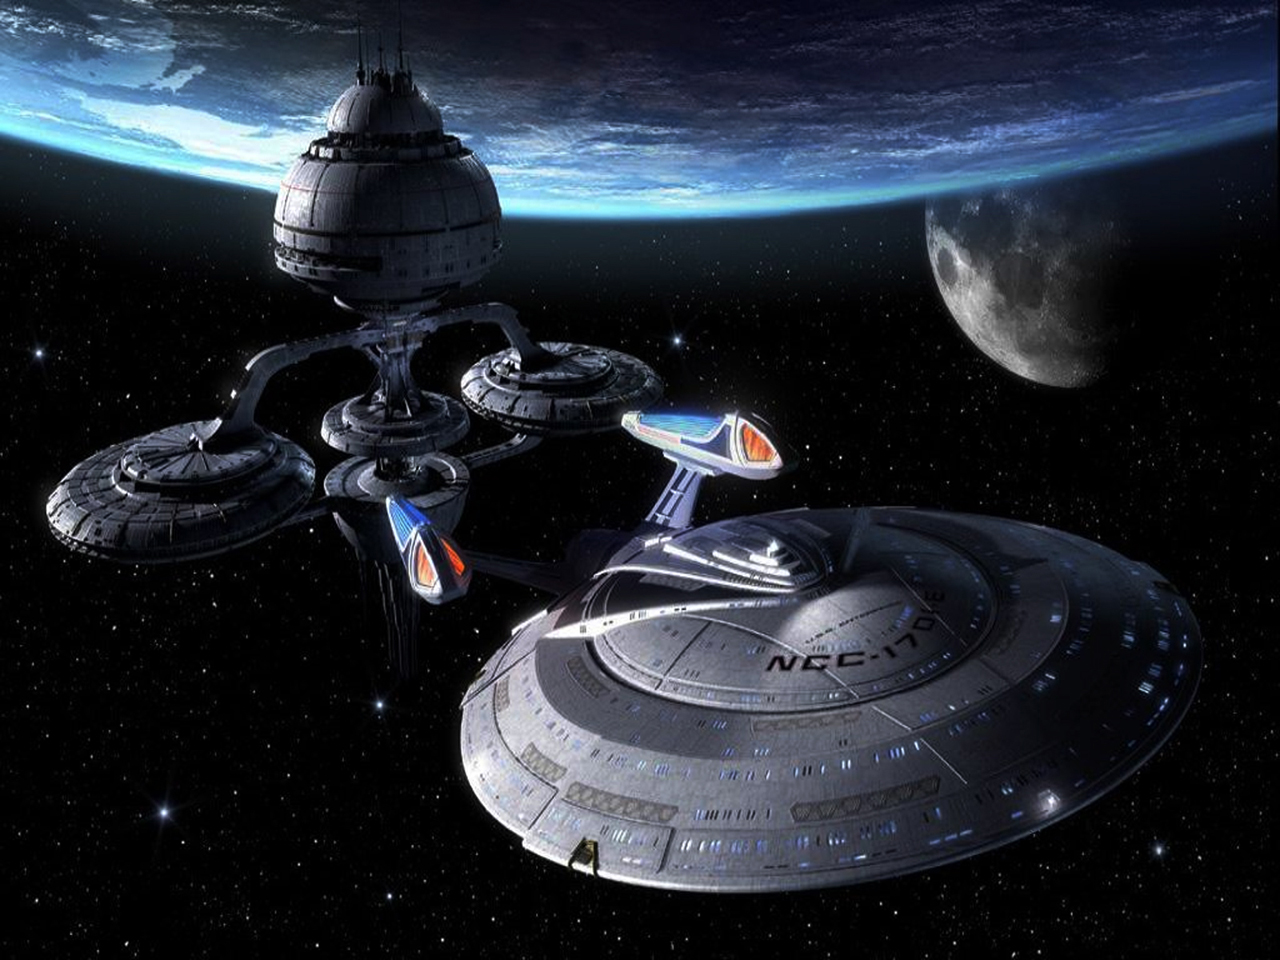 o1kICf Uss Voyager Schematics on sci-fi spaceship schematics, star trek warp drive schematics, star trek shuttle craft schematics, uss x-1, 1701-d schematics, uss defiant specs, star trek ship schematics, gilso star trek schematics, yamato 2199 schematics, uss enterprise plans, firefly ship schematics, uss enterprise d refit, starship enterprise schematics, uss enterprise ncc-1701 specifications, star trek lcars schematics, new star trek starship schematics, uss enterprise saucer separation, uss enterprise diagram, uss enterprise nx-01 refit,